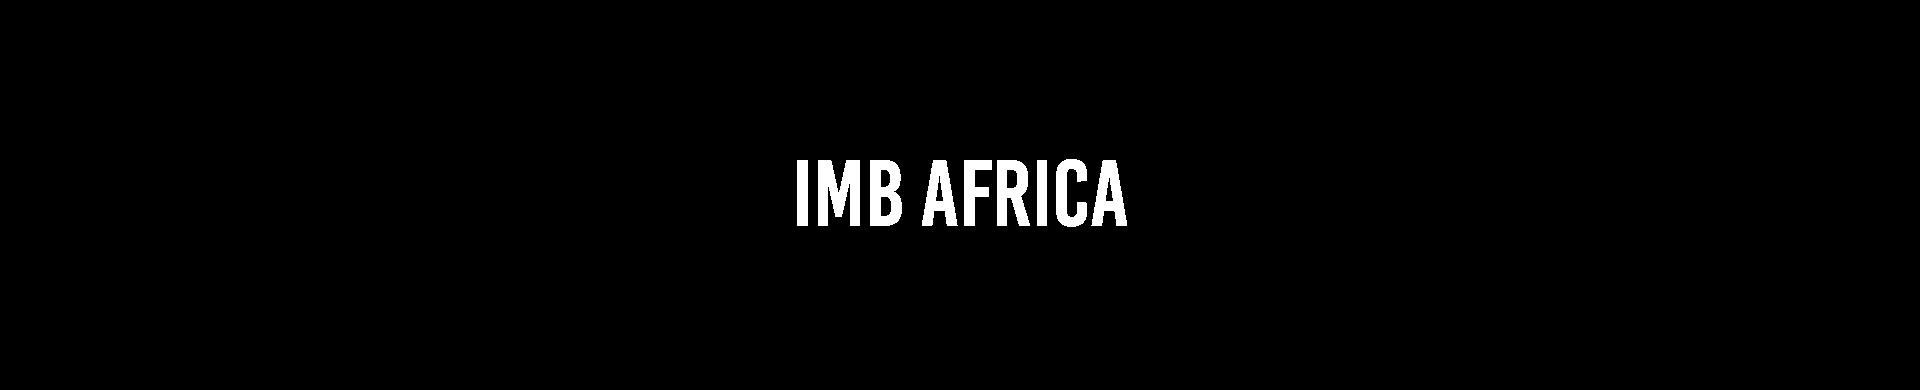 IMB-africa